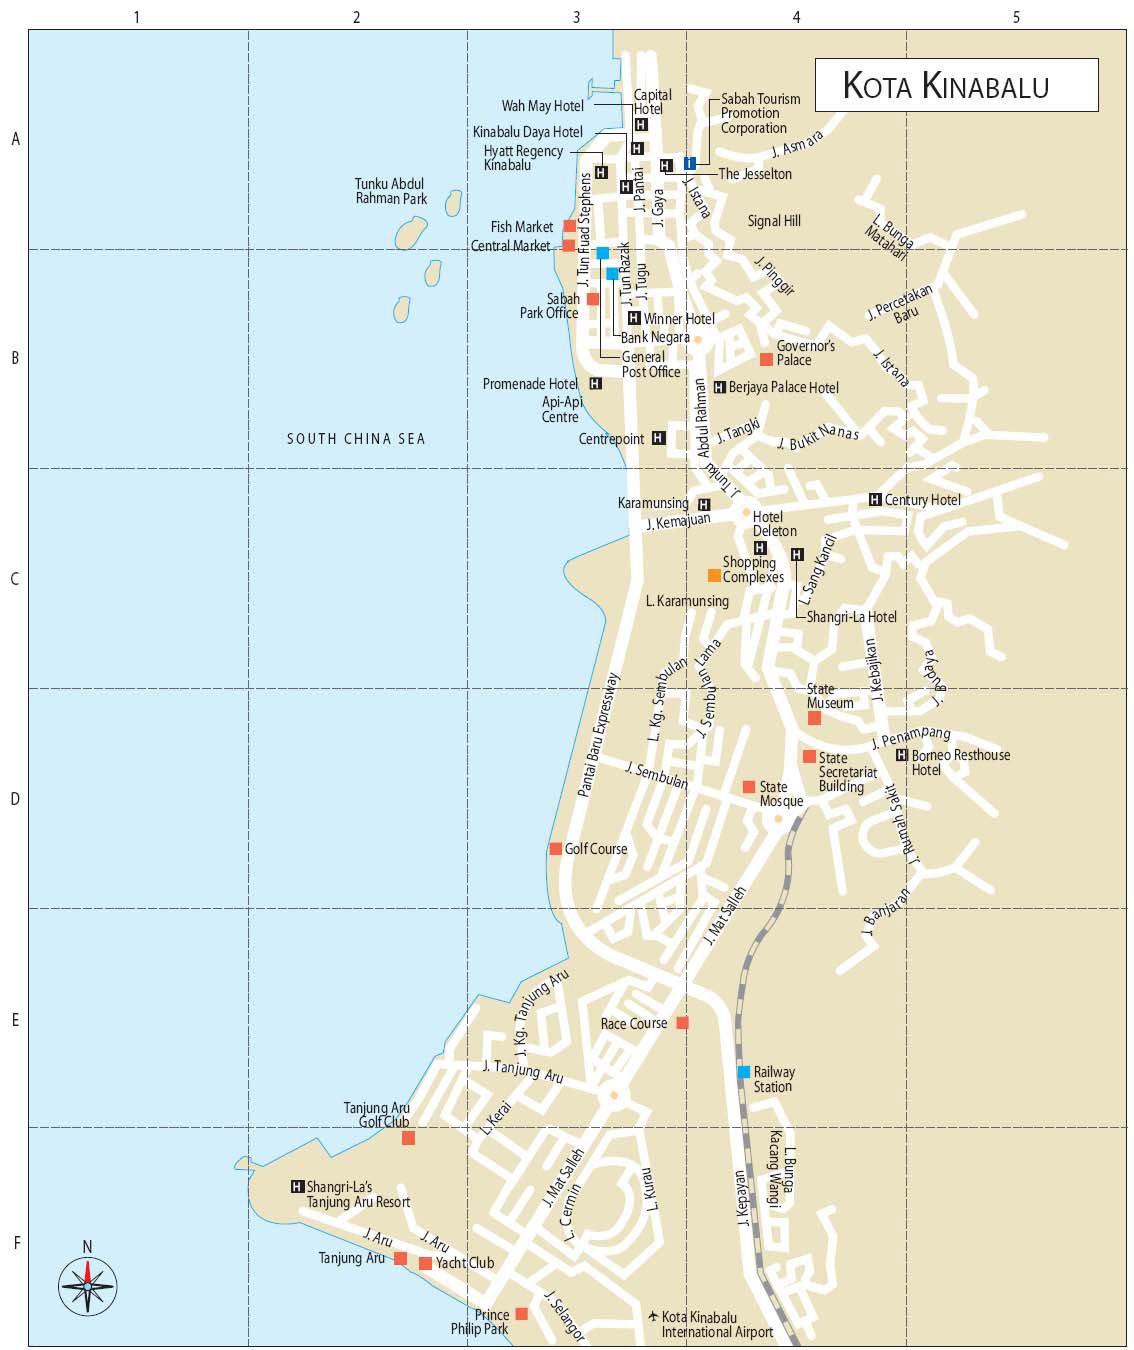 Image Map Kota Kinabalu Bigjpg Travel Wiki Fandom Powered By